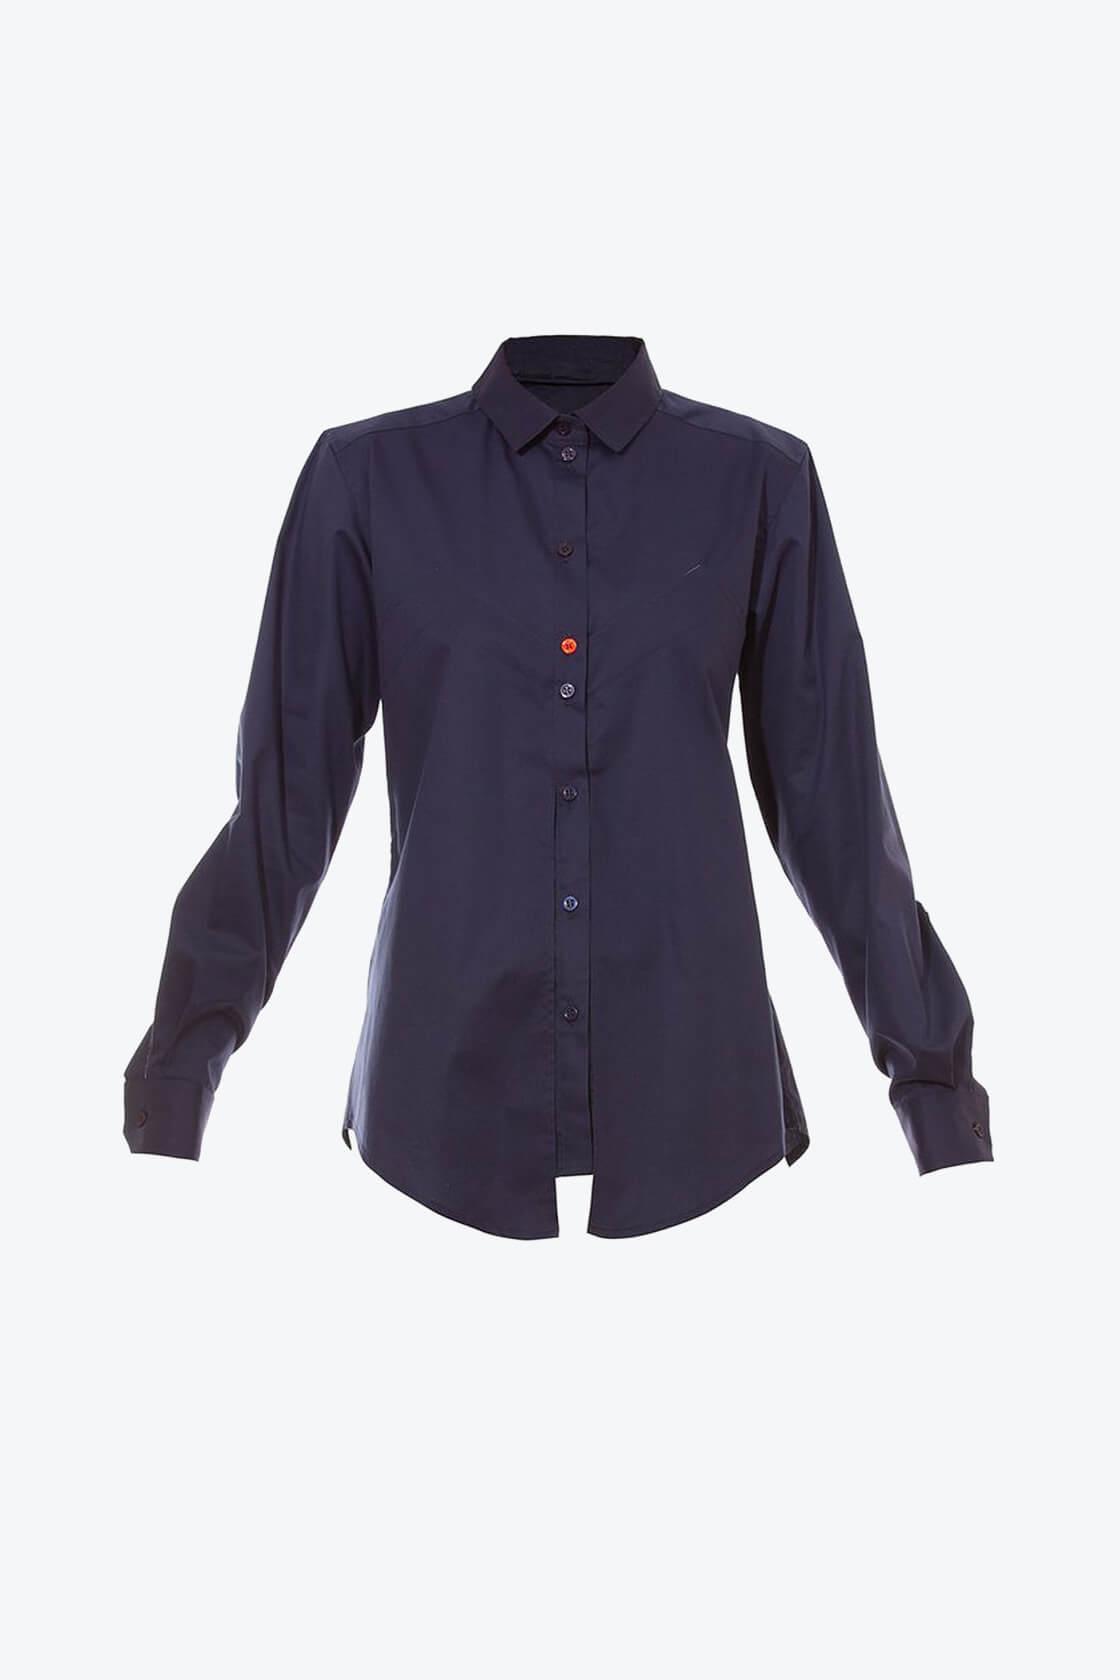 OL10000196 Long sleeve shirt blouse1